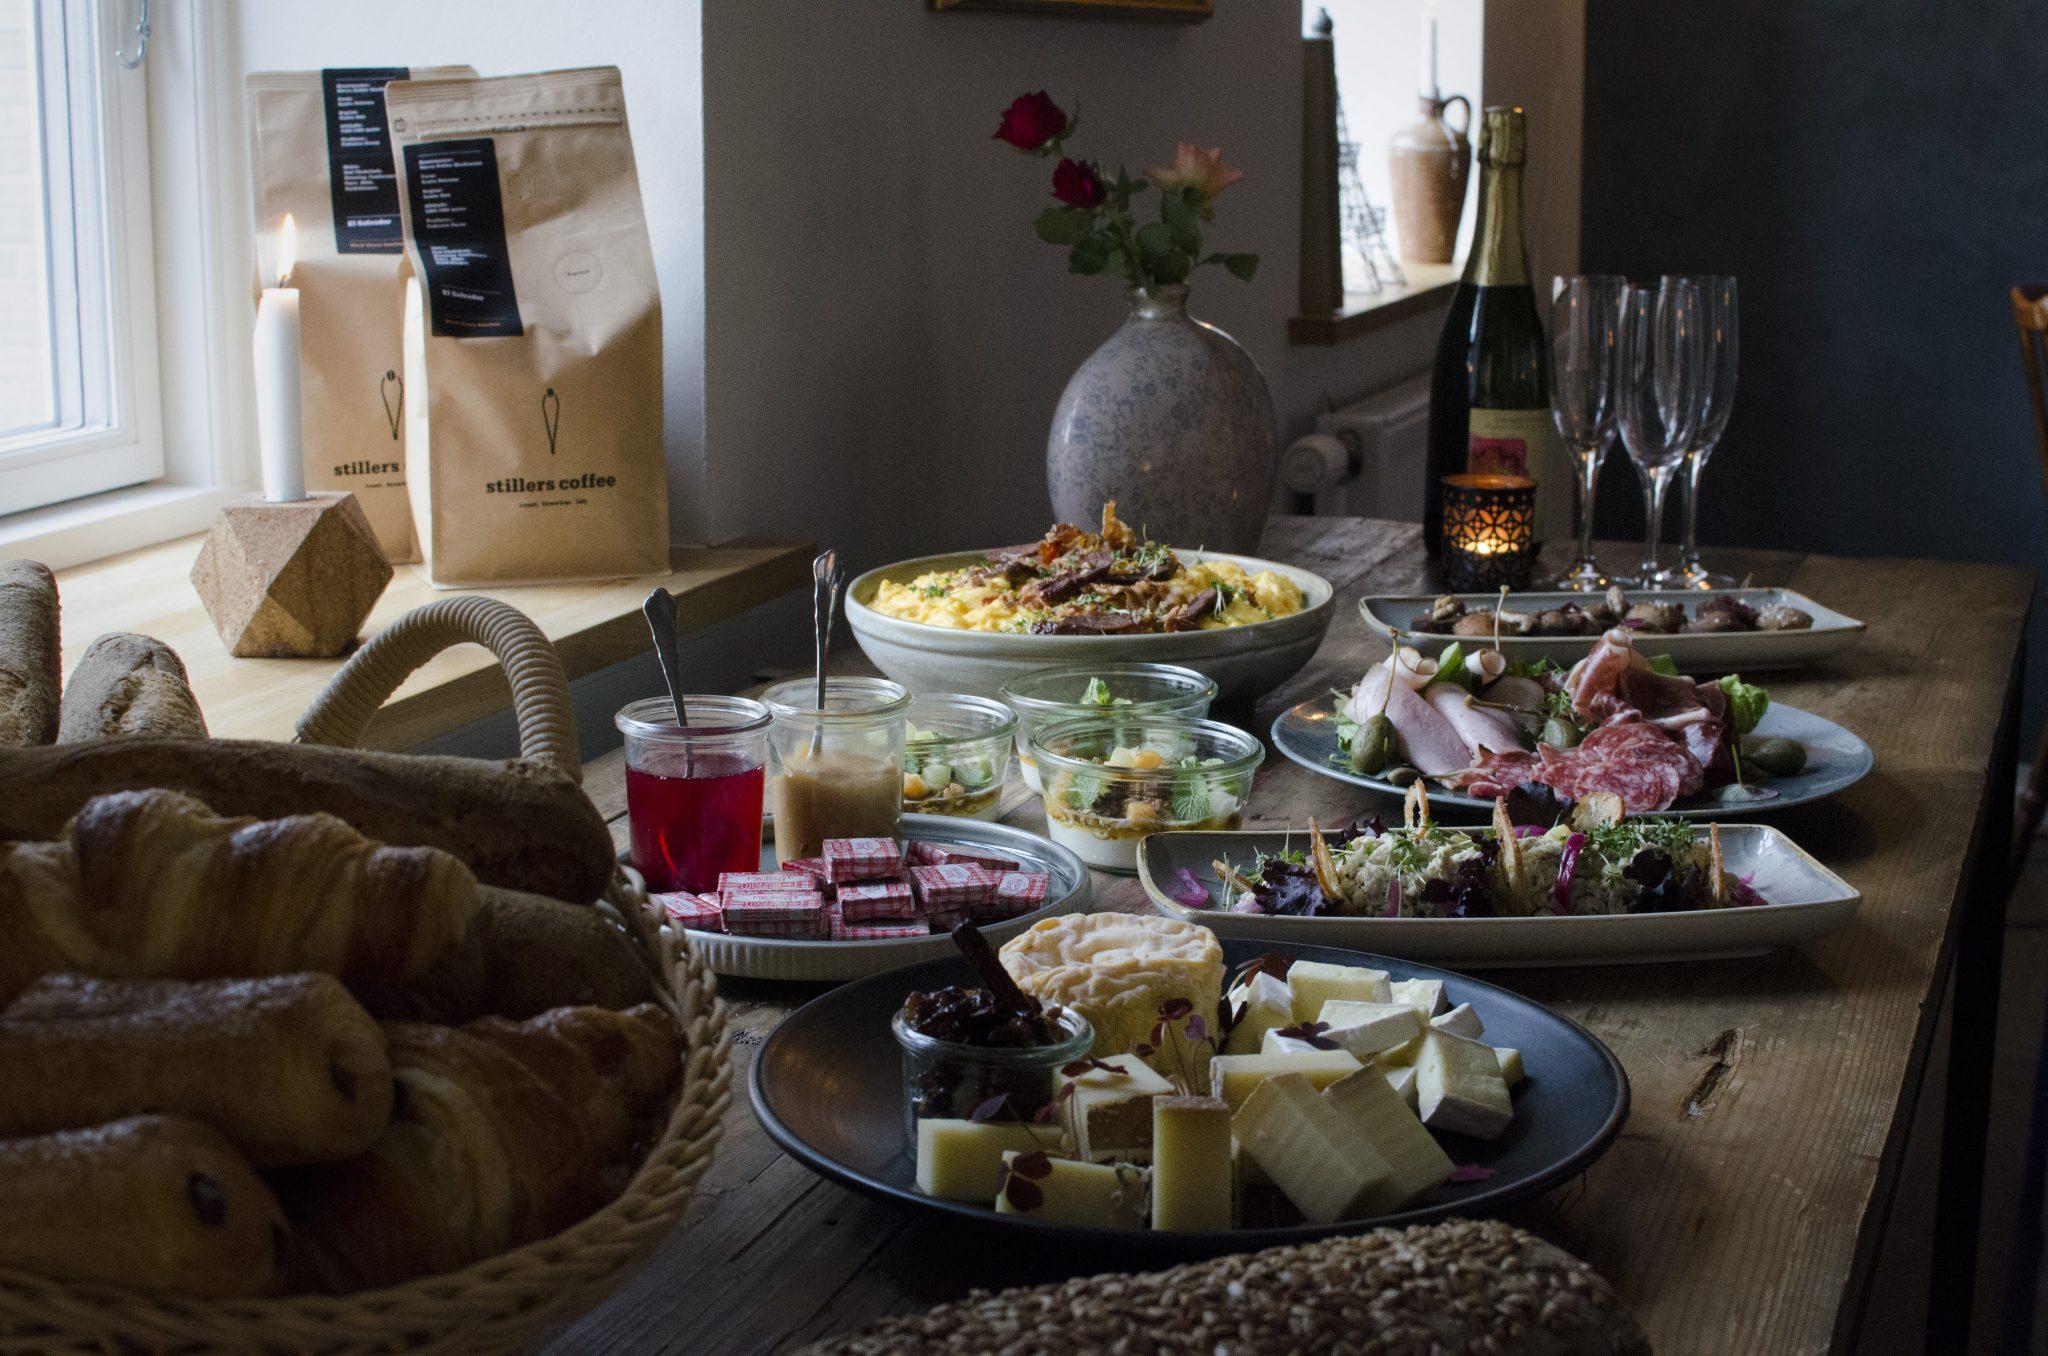 Luksus brunch bord